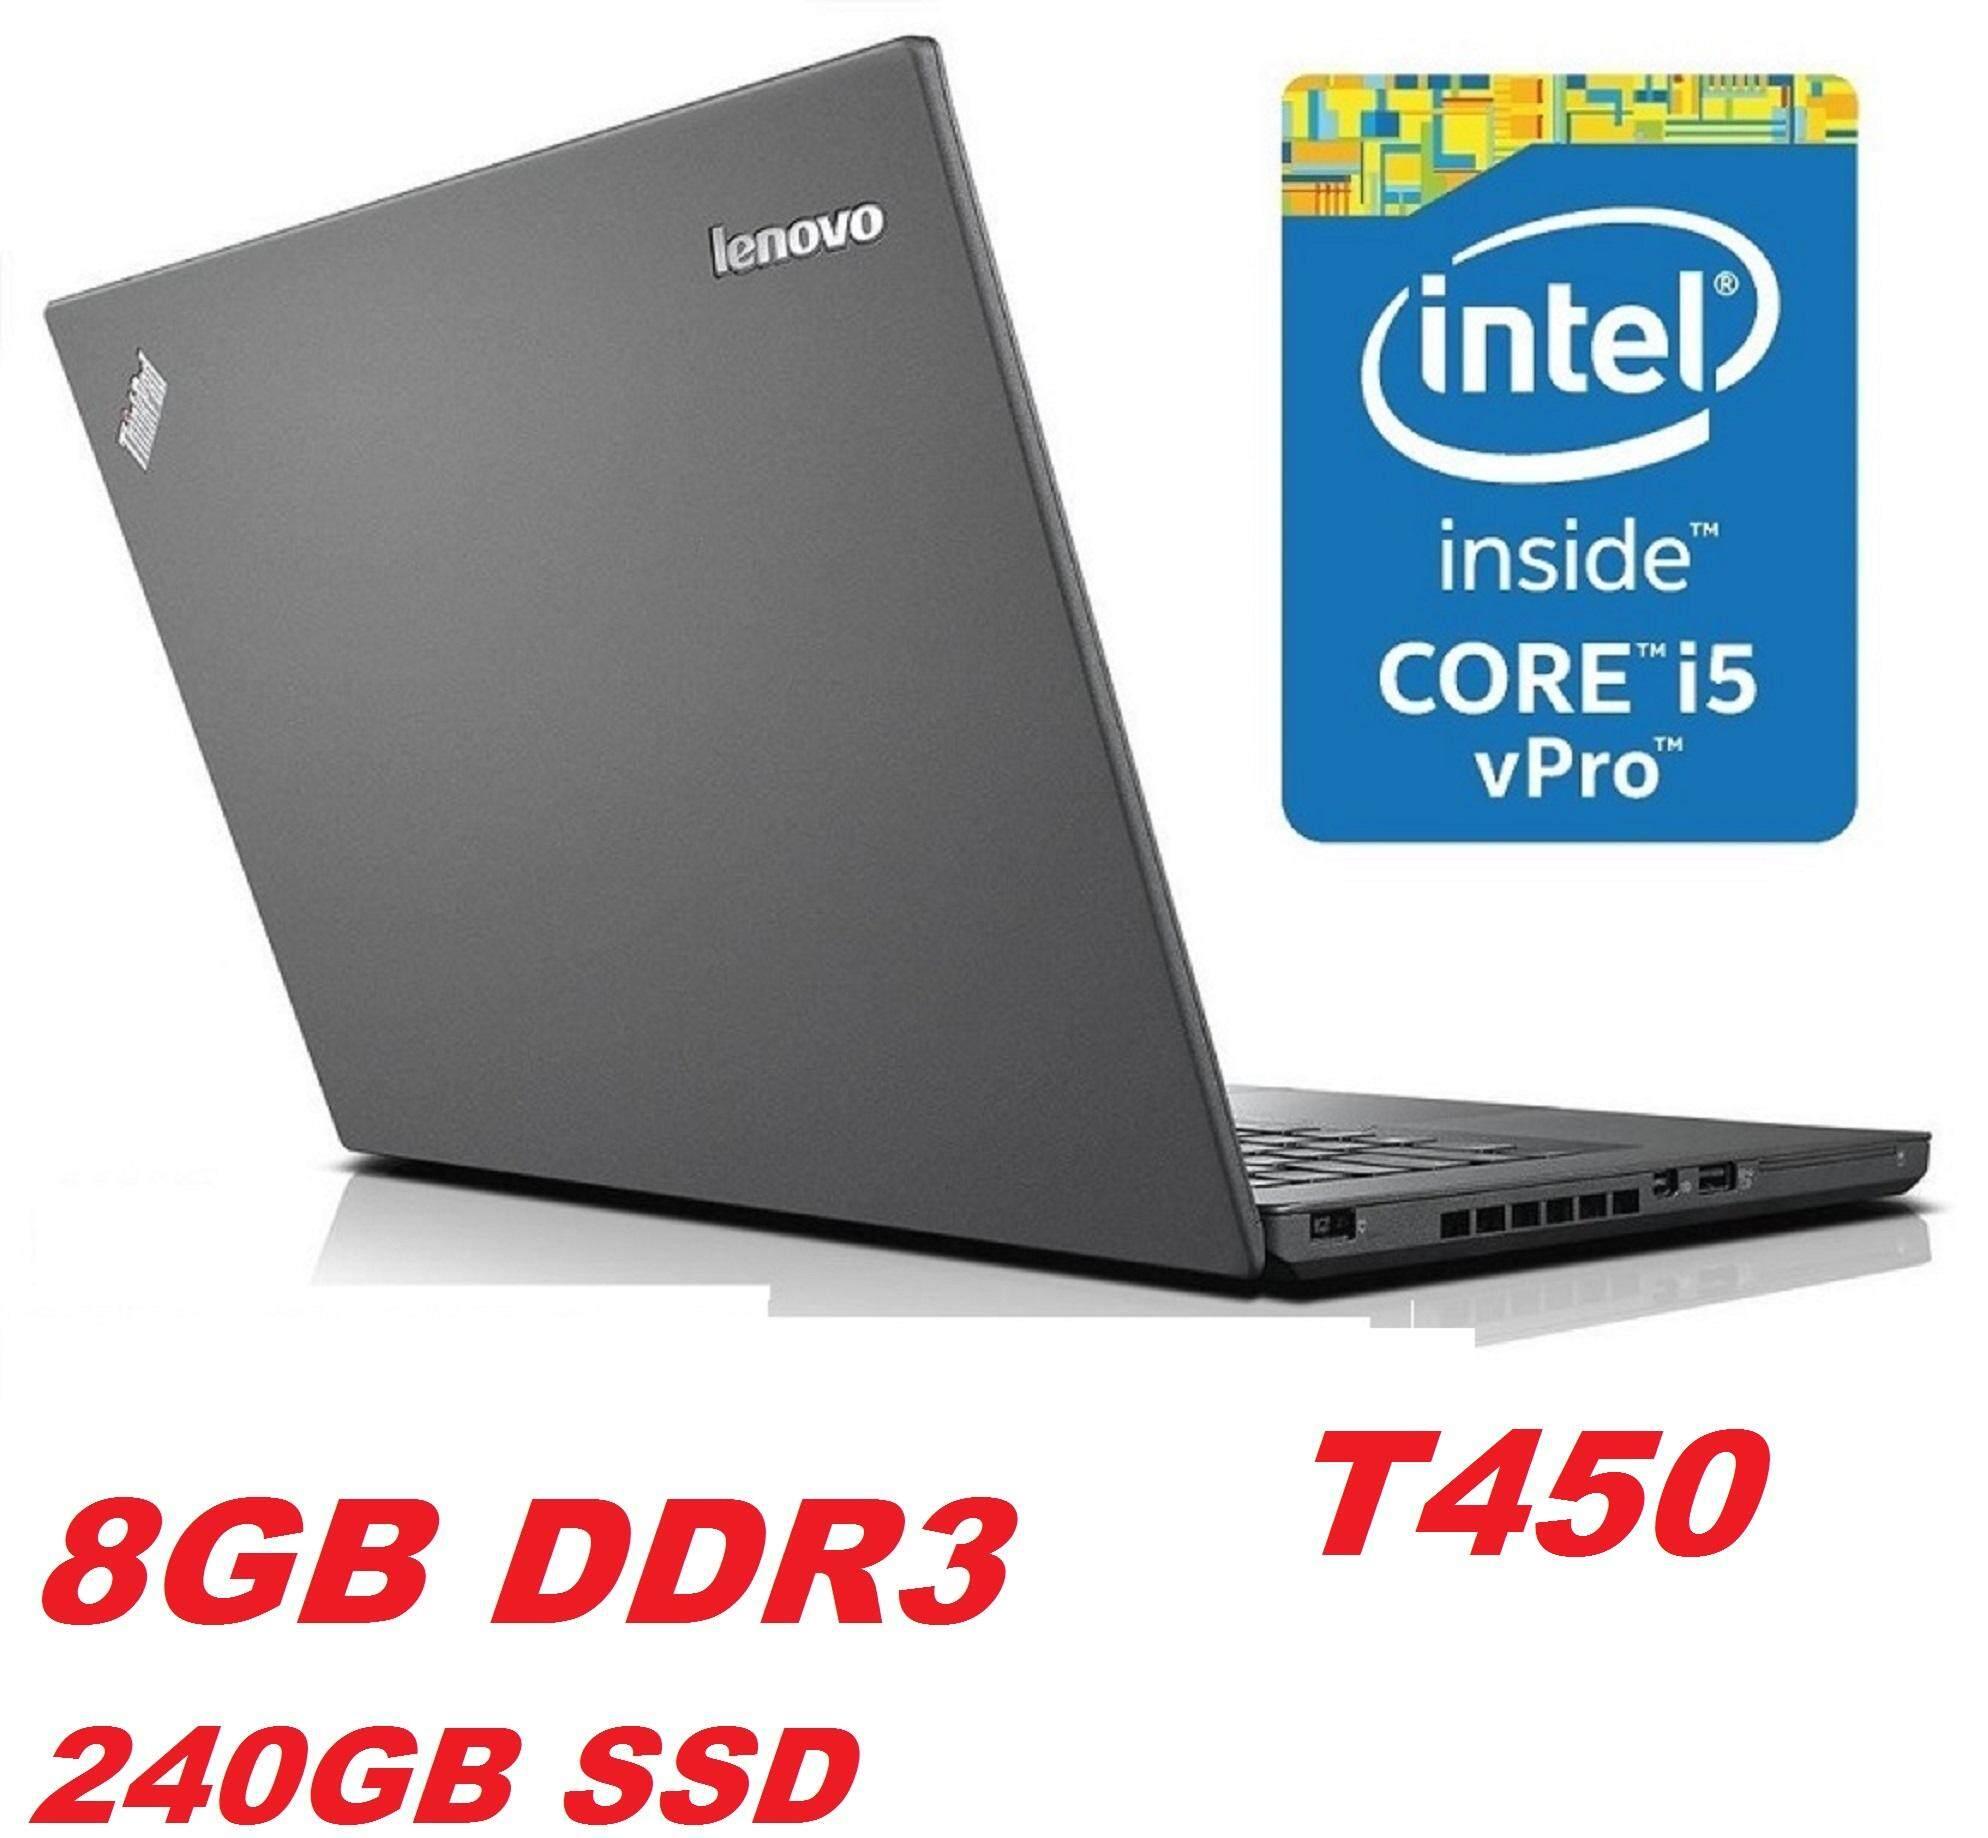 LENOVO THINKPAD T450 INTEL CORE i5 5TH GEN5300U 2.3 GHZ/8GB DDR3 RAM/240GB SSD/14 LED SCREEN/INTEL HD GRAPHIC CARD/WIN 10 PRO Malaysia